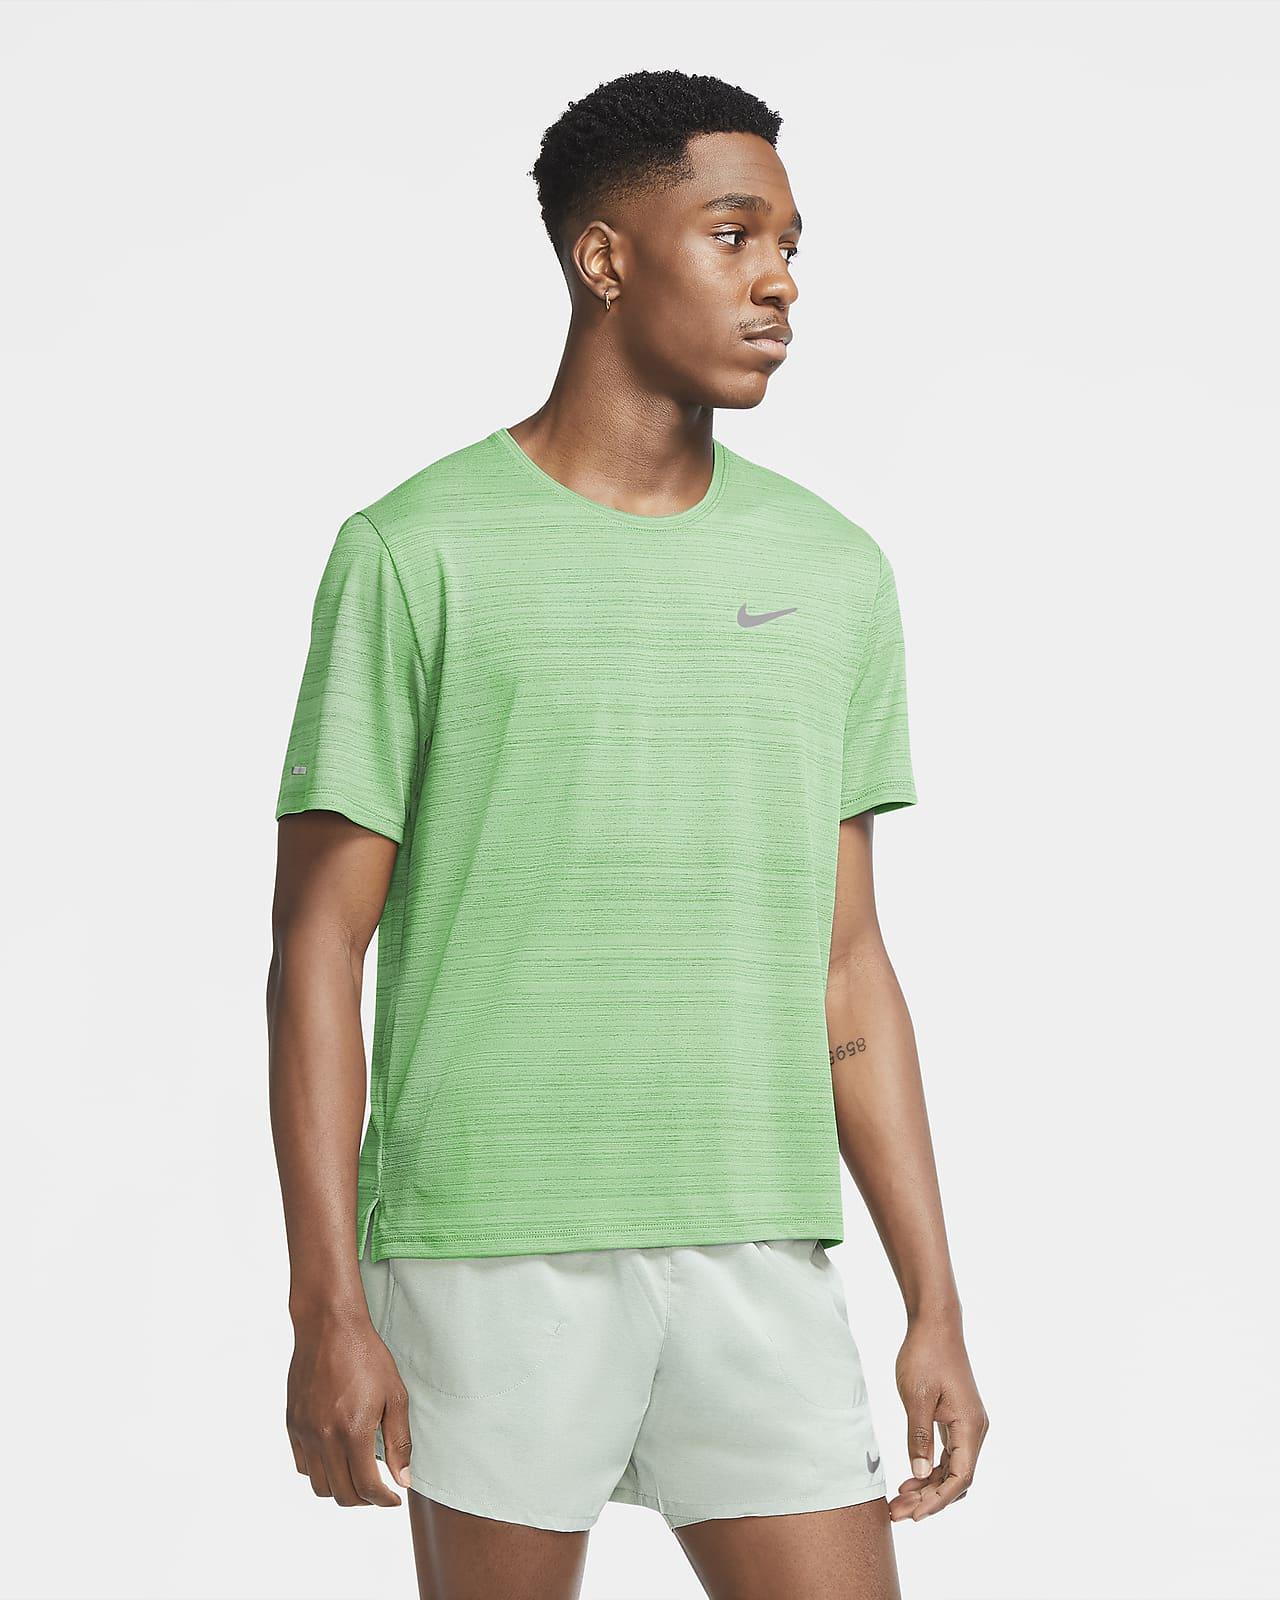 Generoso pelota ducha  Camiseta de running para hombre Nike Dri-FIT Miler. Nike.com